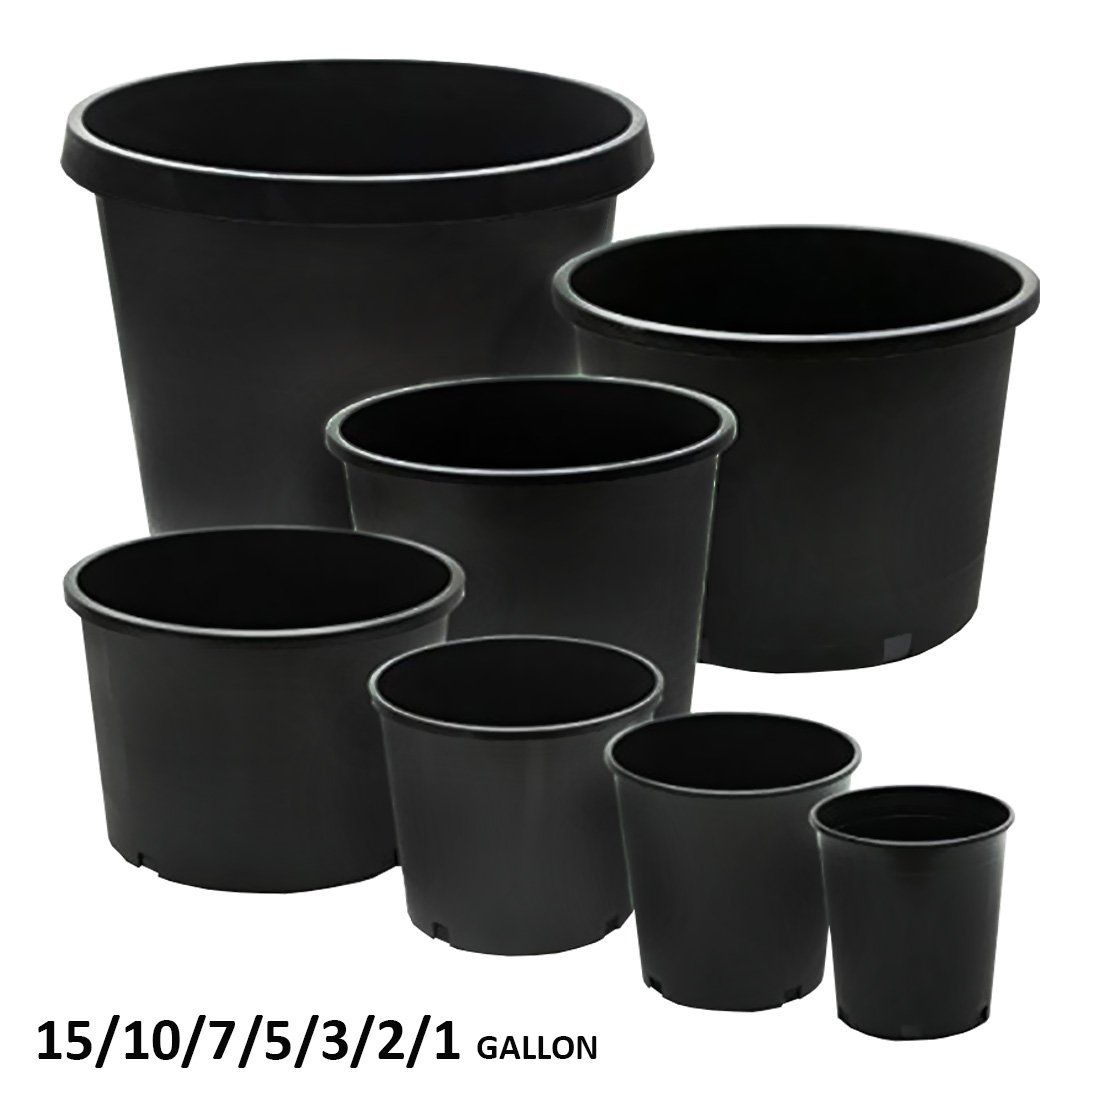 Calipots 5pack 5 Gallon Premium Black Plastic Nursery Plant Container Garden Planter Pots 5 Gallon Ch Plastic Plant Pots Garden Planters Pots Plant Nursery